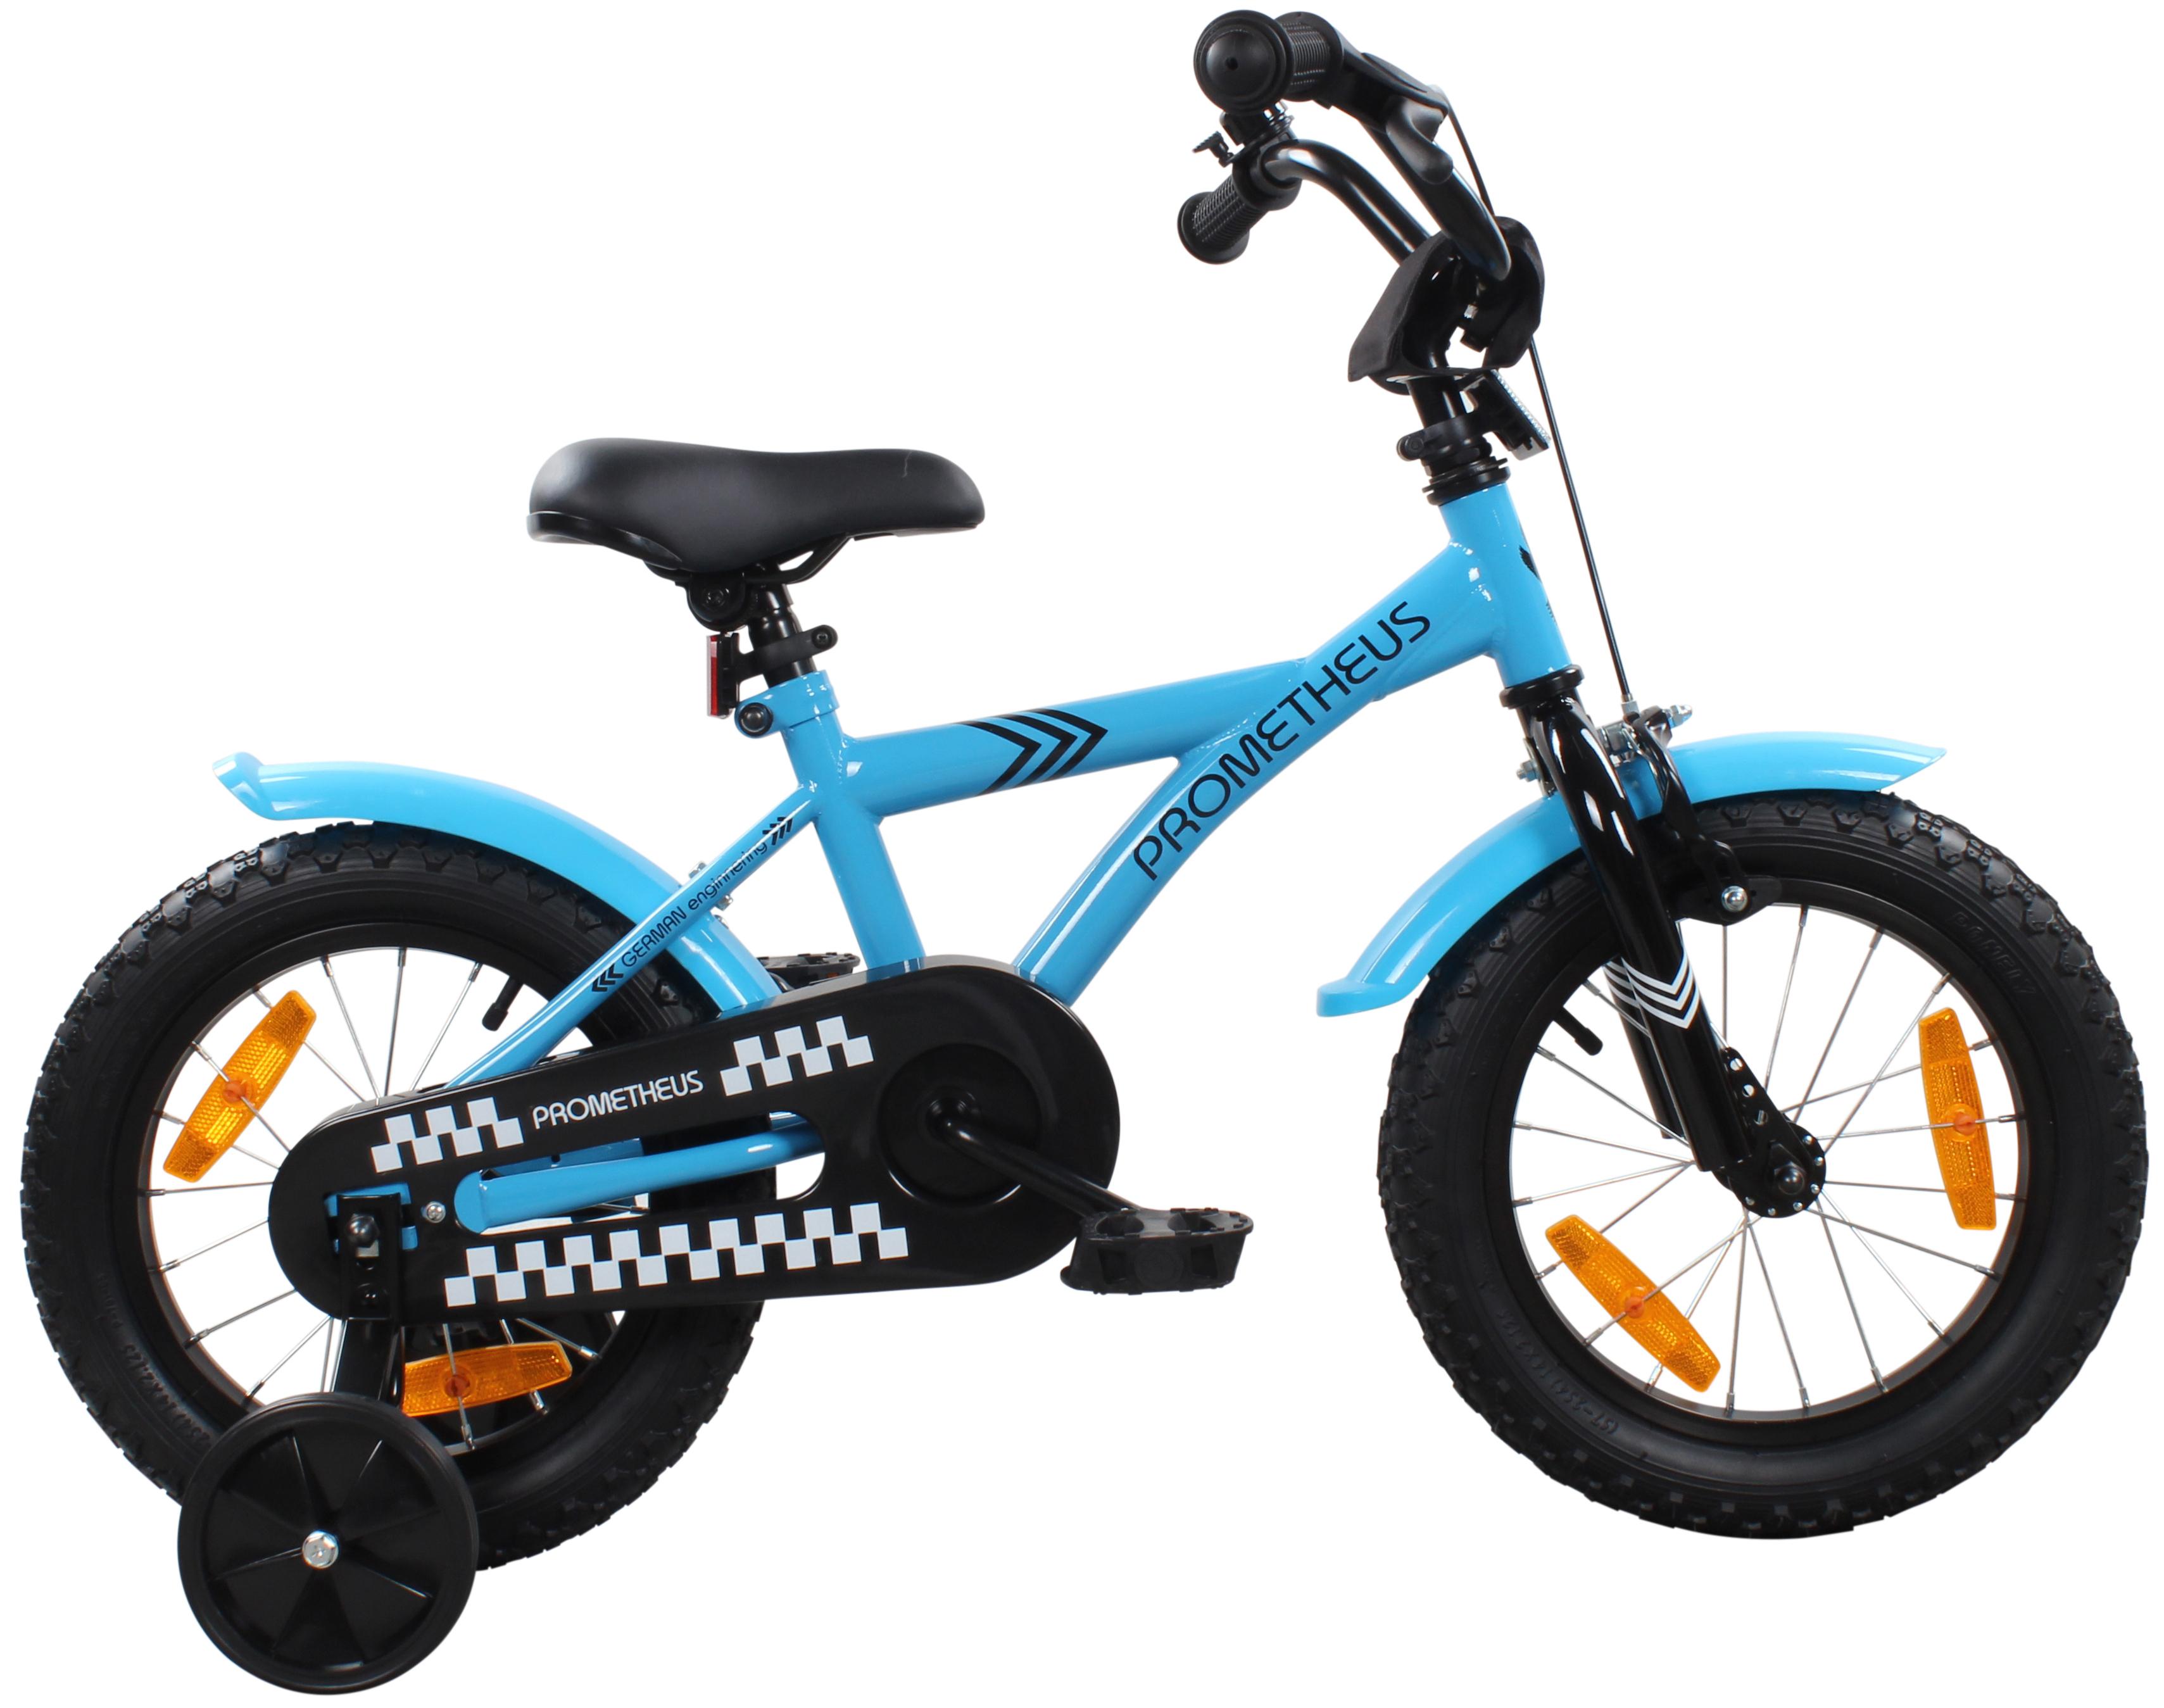 kinderfahrrad 14 14 zoll prometheus kinder fahrrad farbe blau wei mit r cktrittbremse. Black Bedroom Furniture Sets. Home Design Ideas